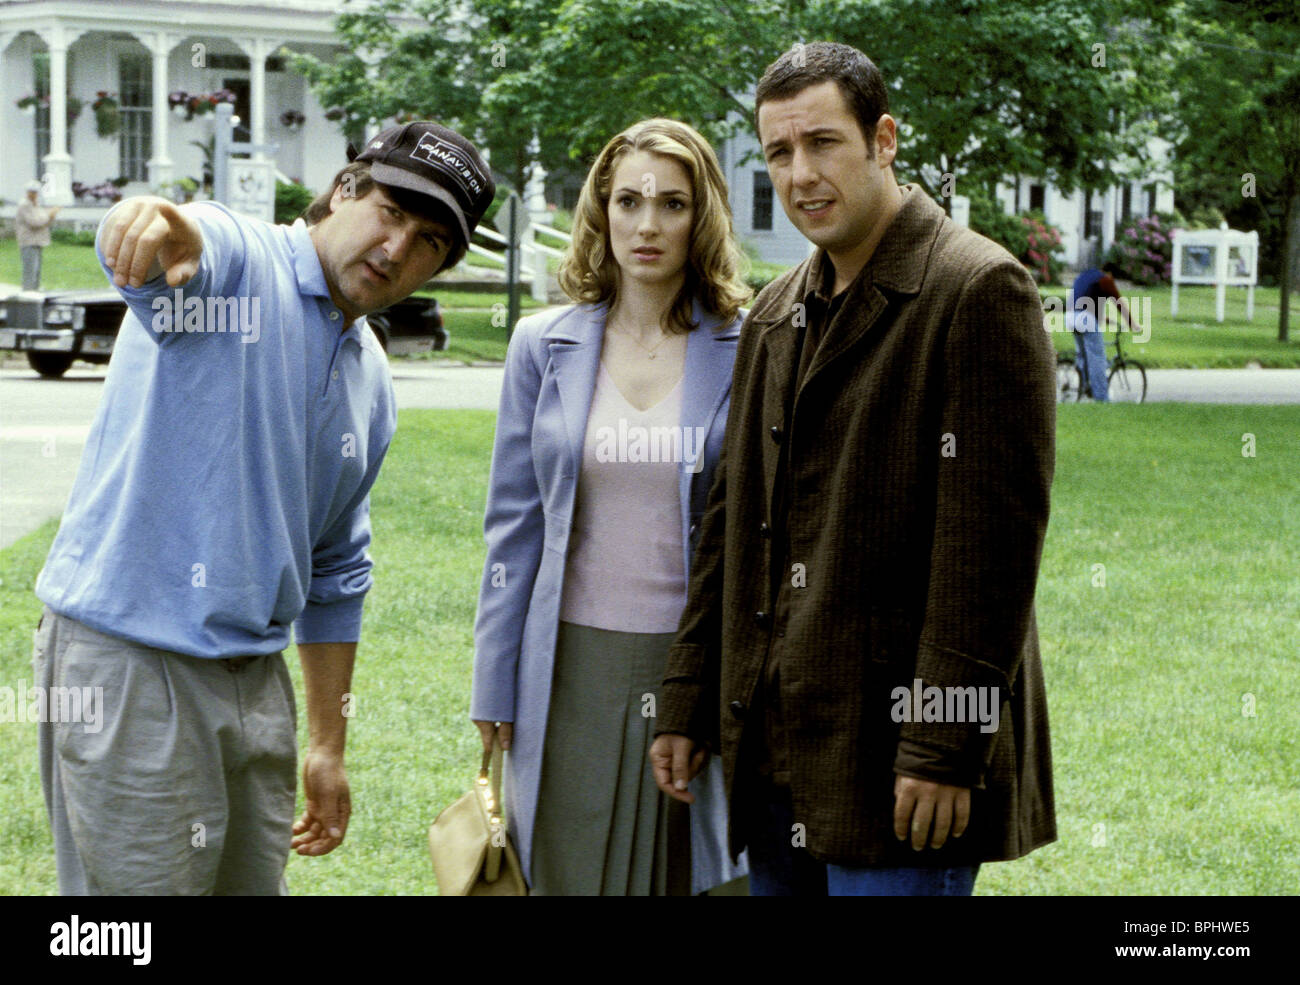 Steve Brill Winona Ryder Adam Sandler Mr Deeds 2002 Stock Photo Alamy